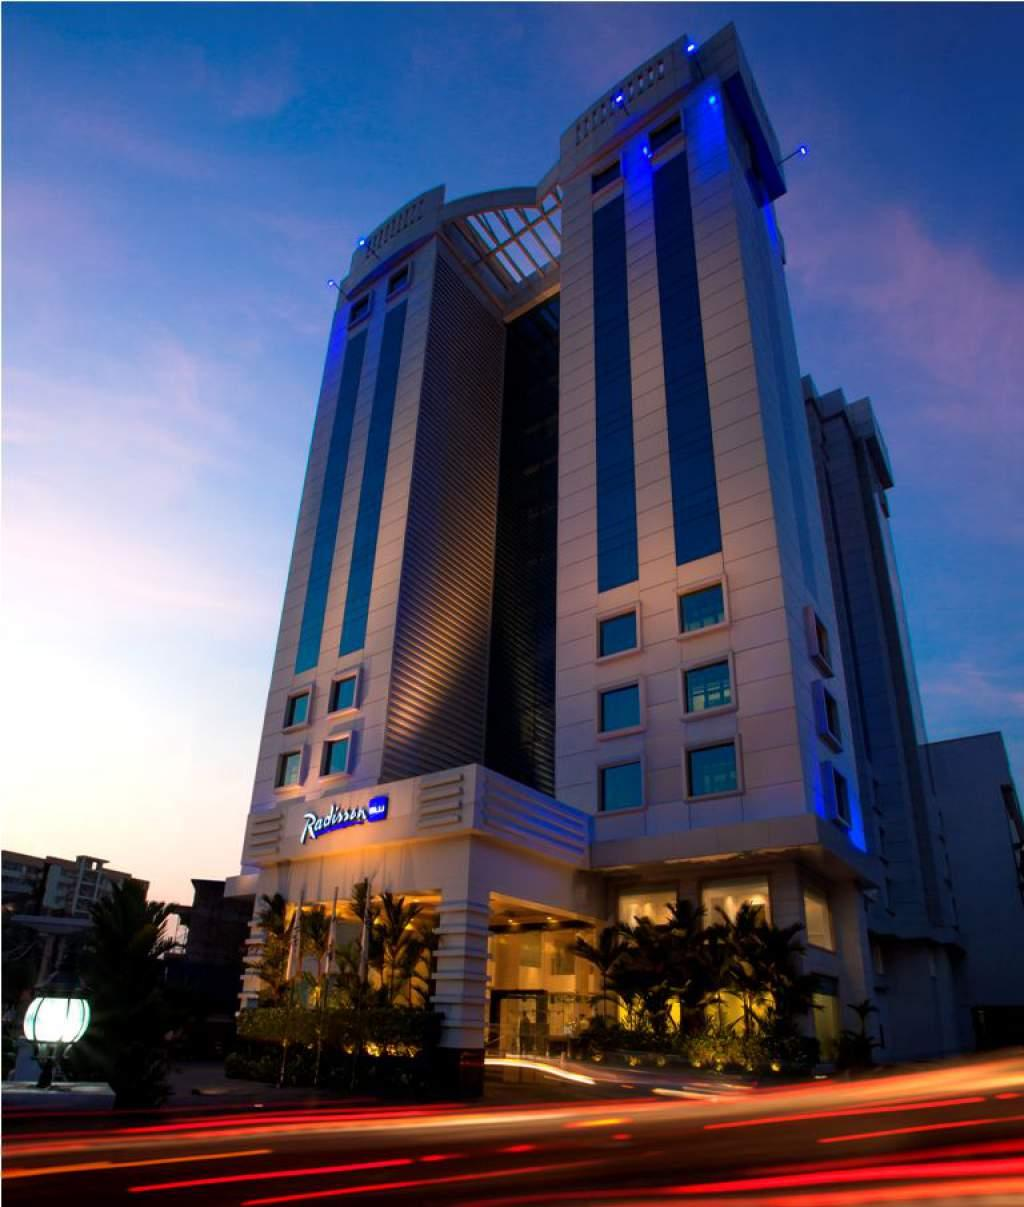 Ernakulam India  City new picture : Radisson Blu Kochi Ernakulam, India : hotel opiniones y fotos de 2016 ...